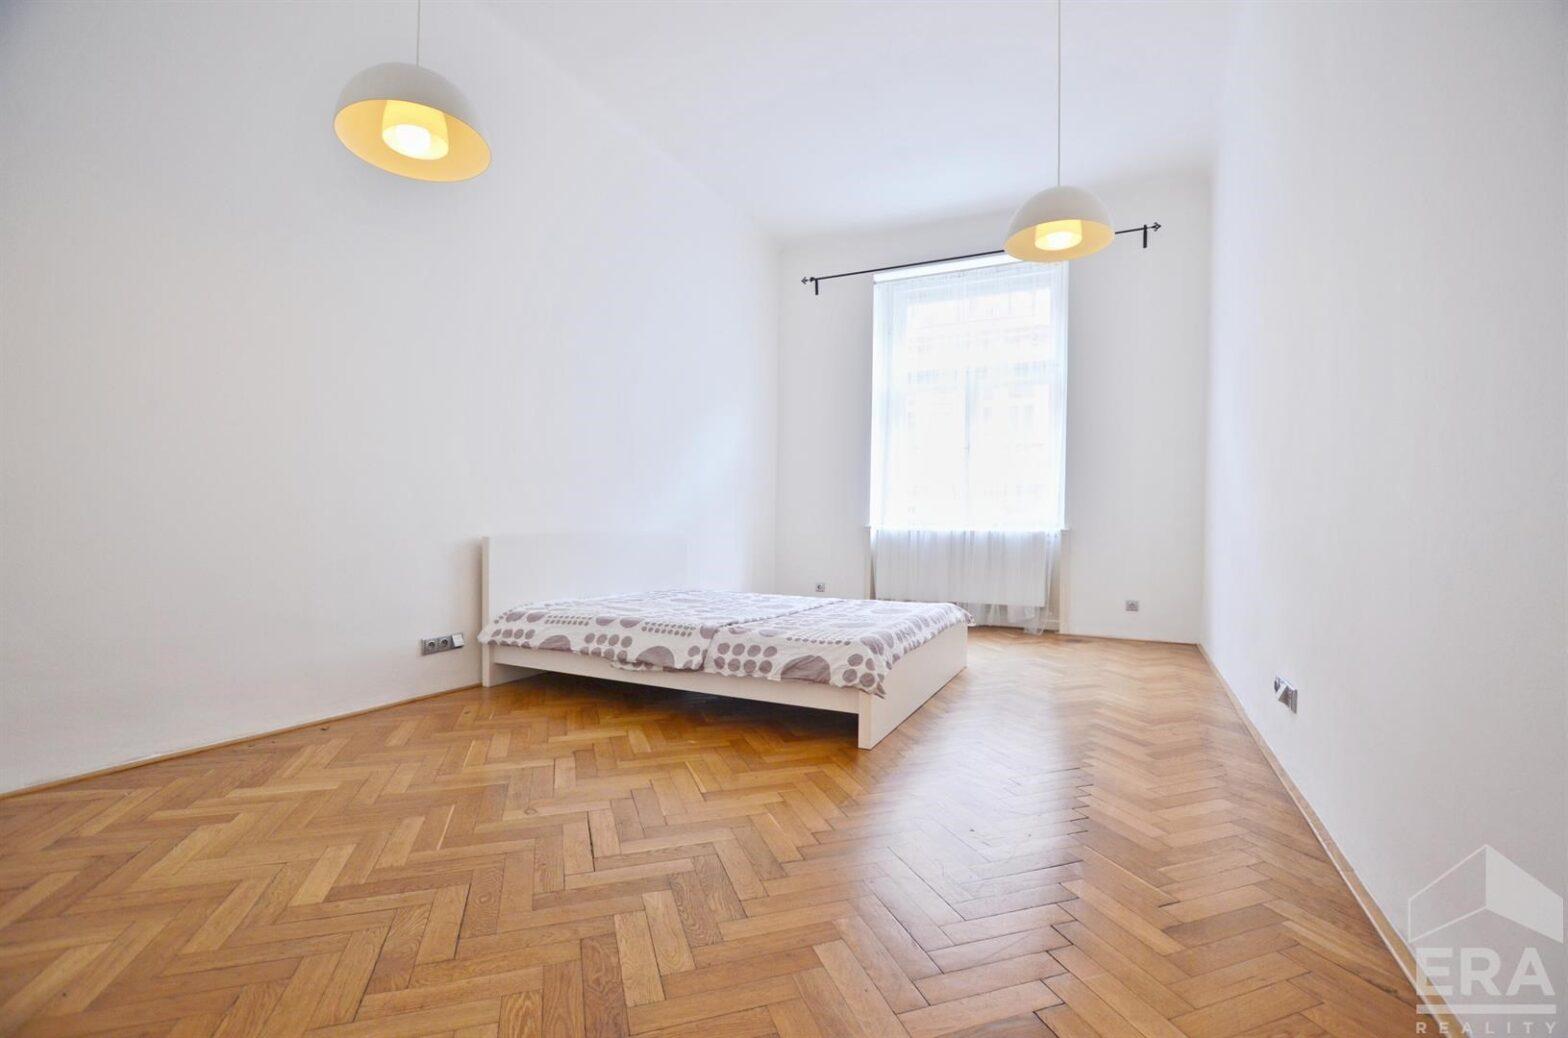 Pronájem bytu 2+KK, 75m2, Praha 5 Smíchov